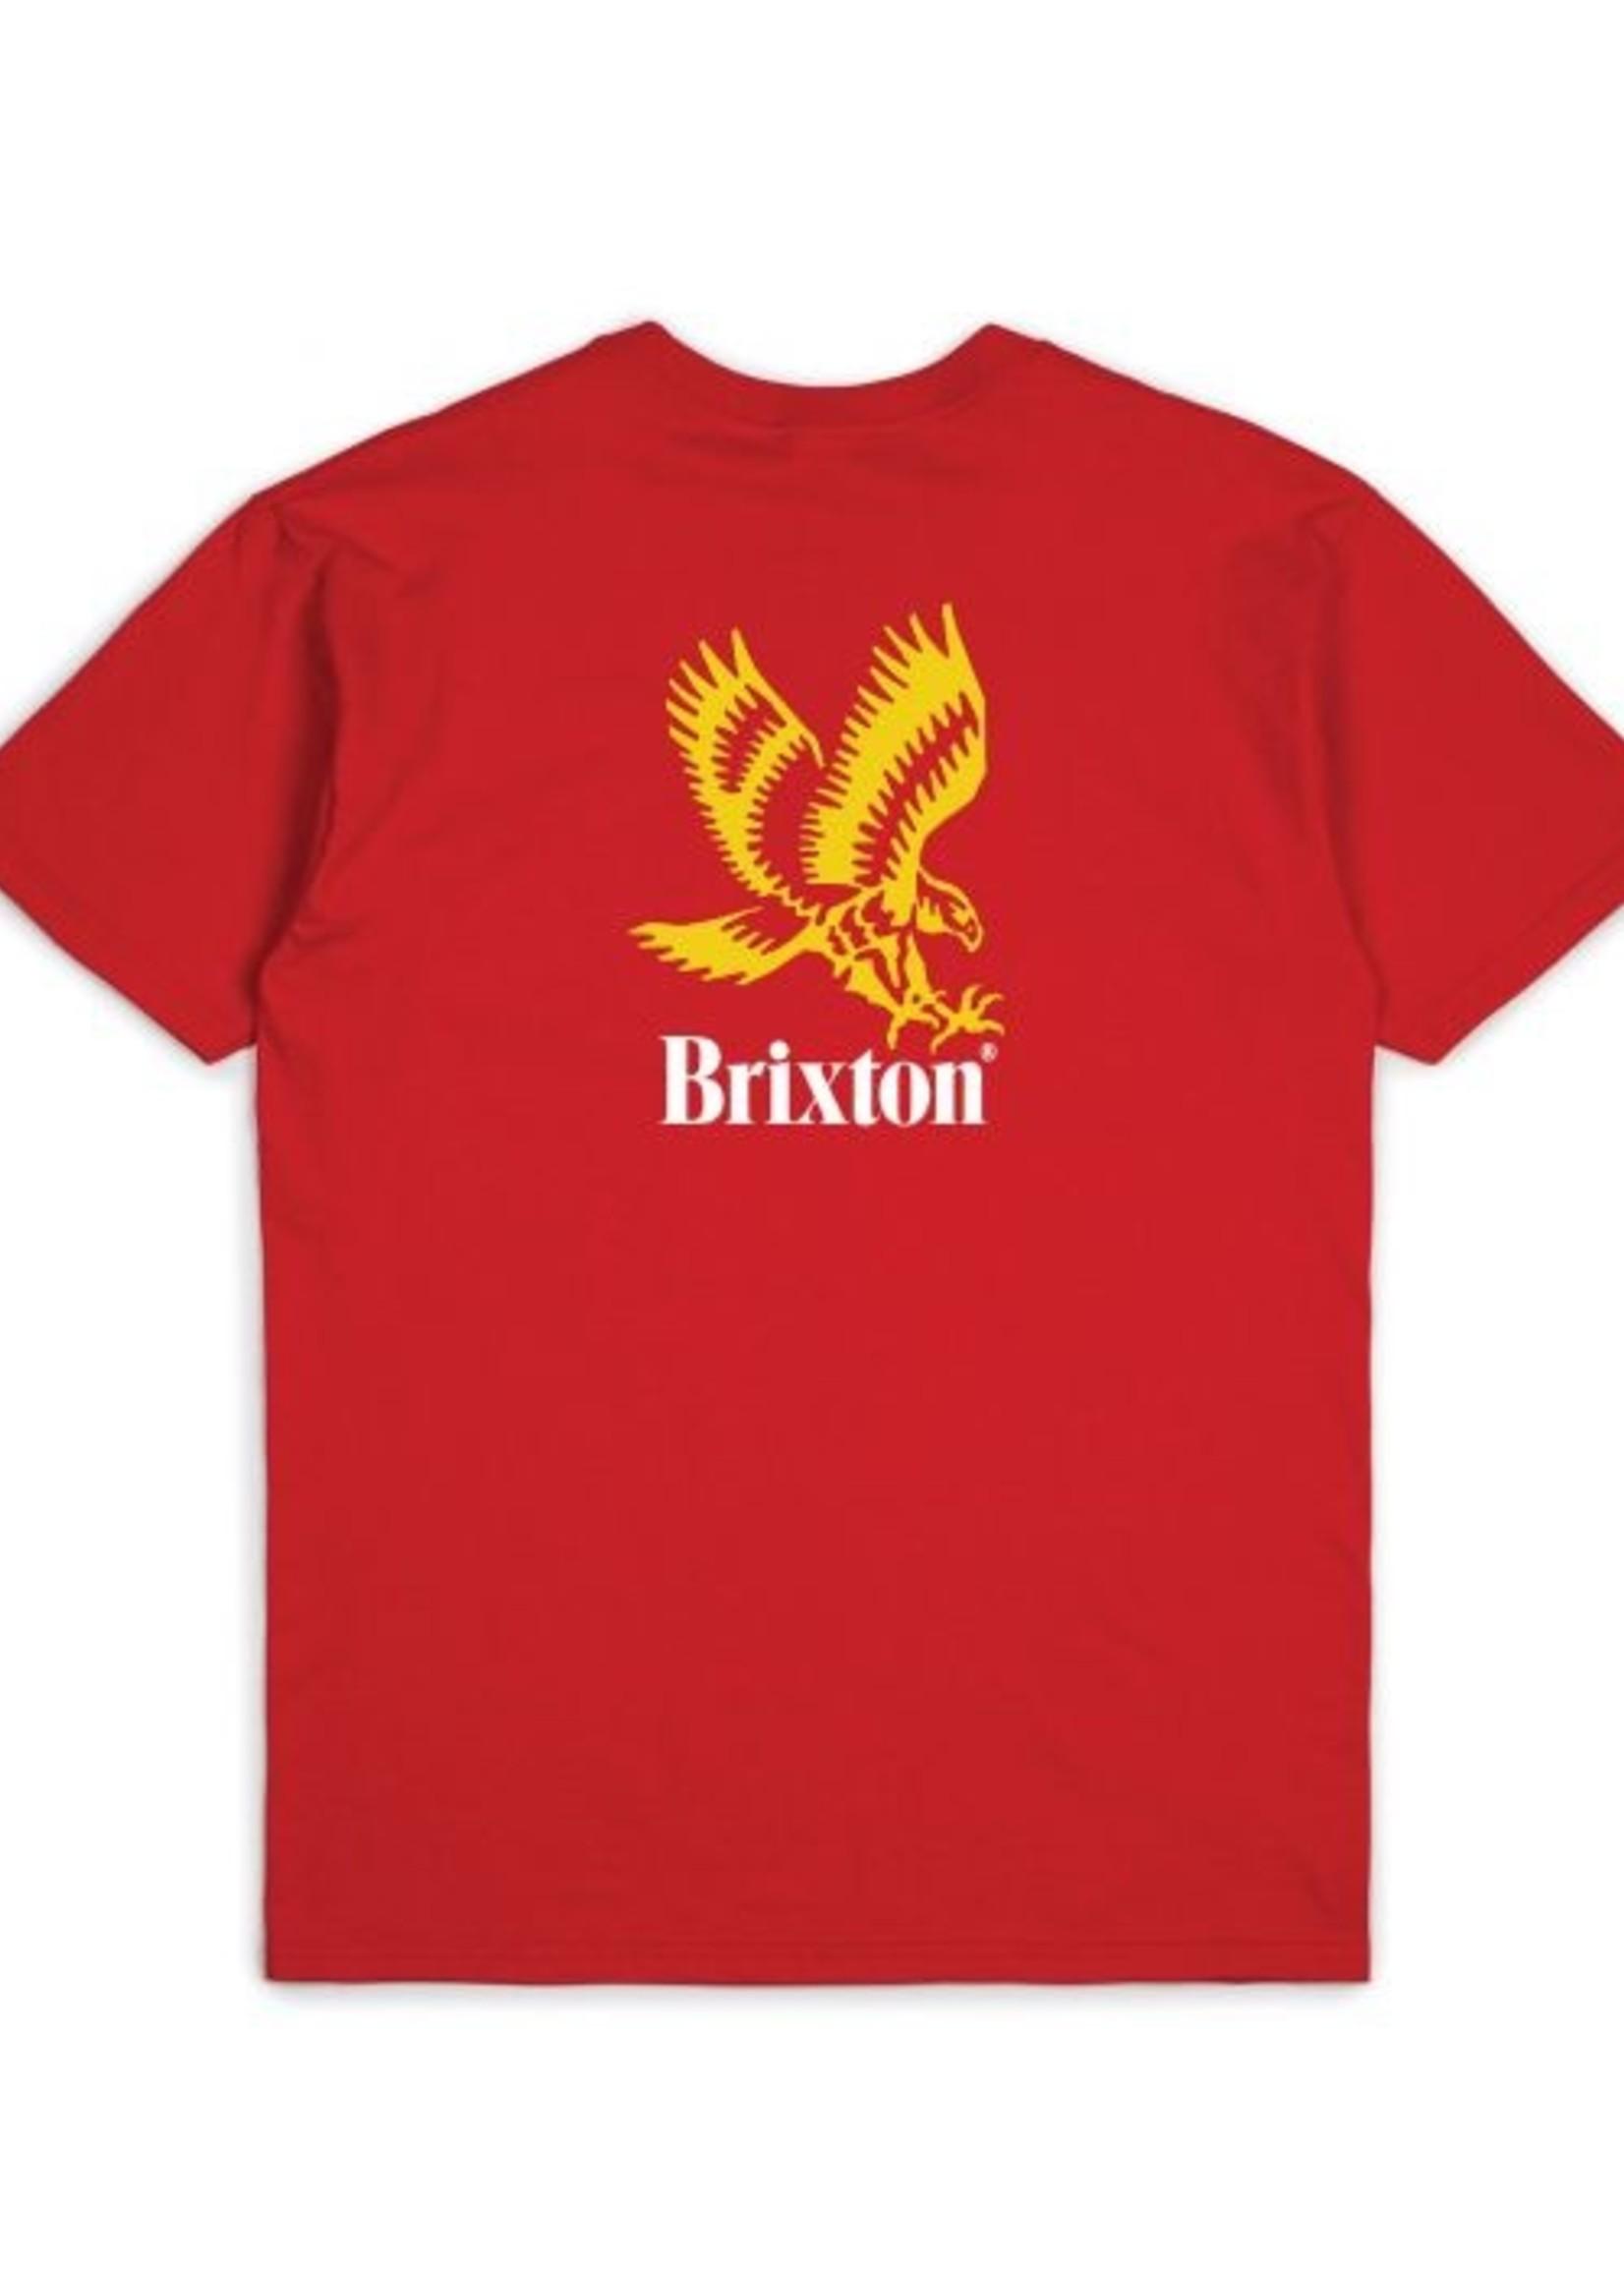 Brixton Descent Tee - Red